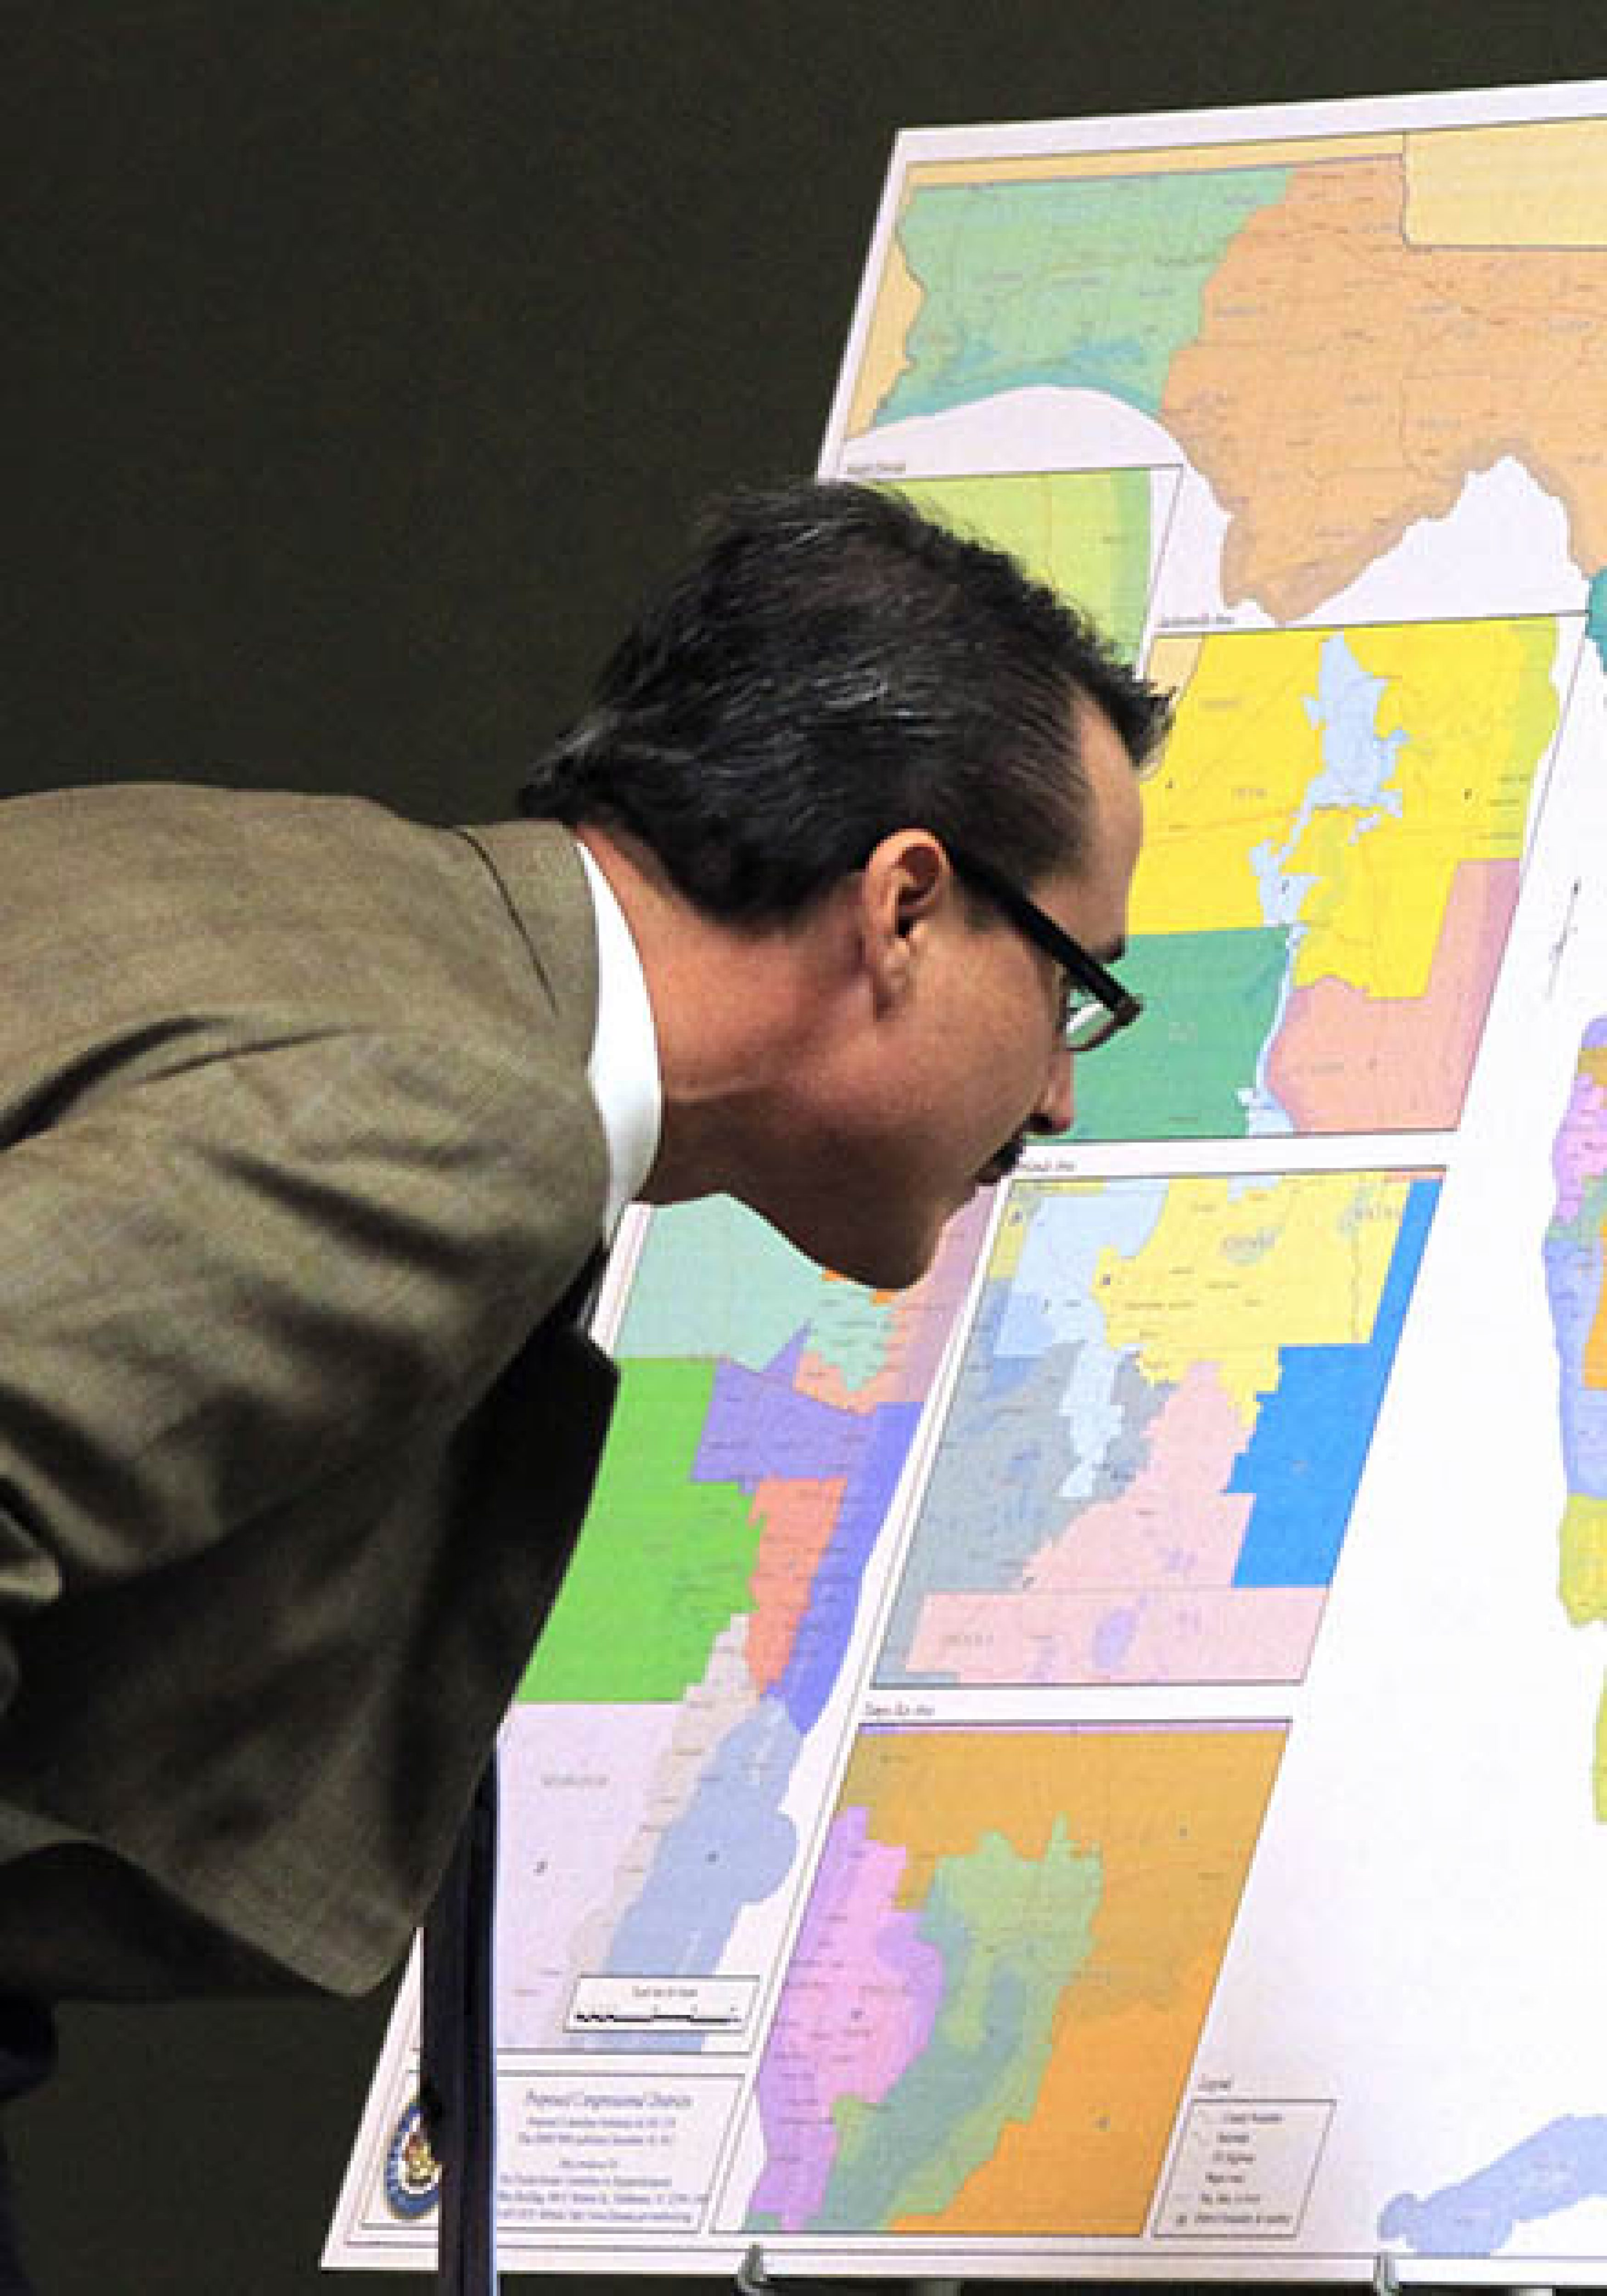 florida_congressional_map_ap_1160-3500x5000.jpg